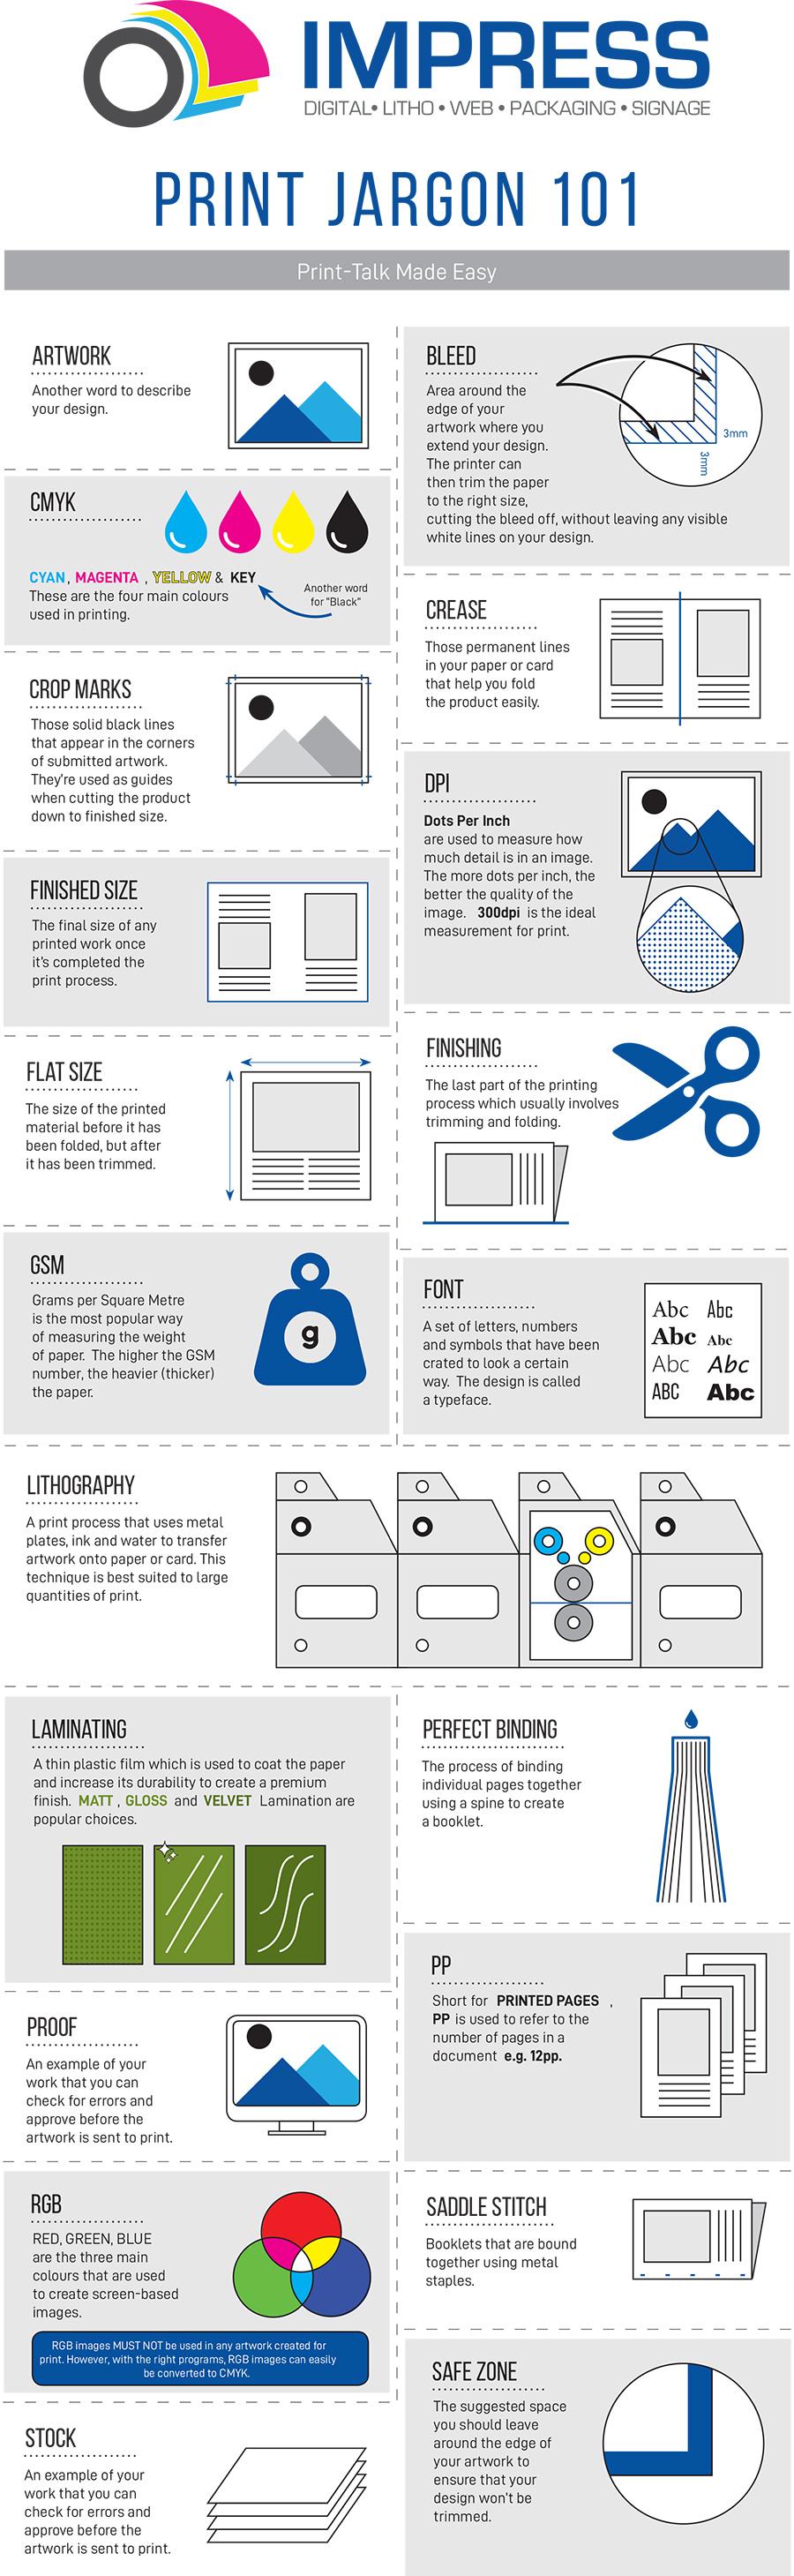 printing guides